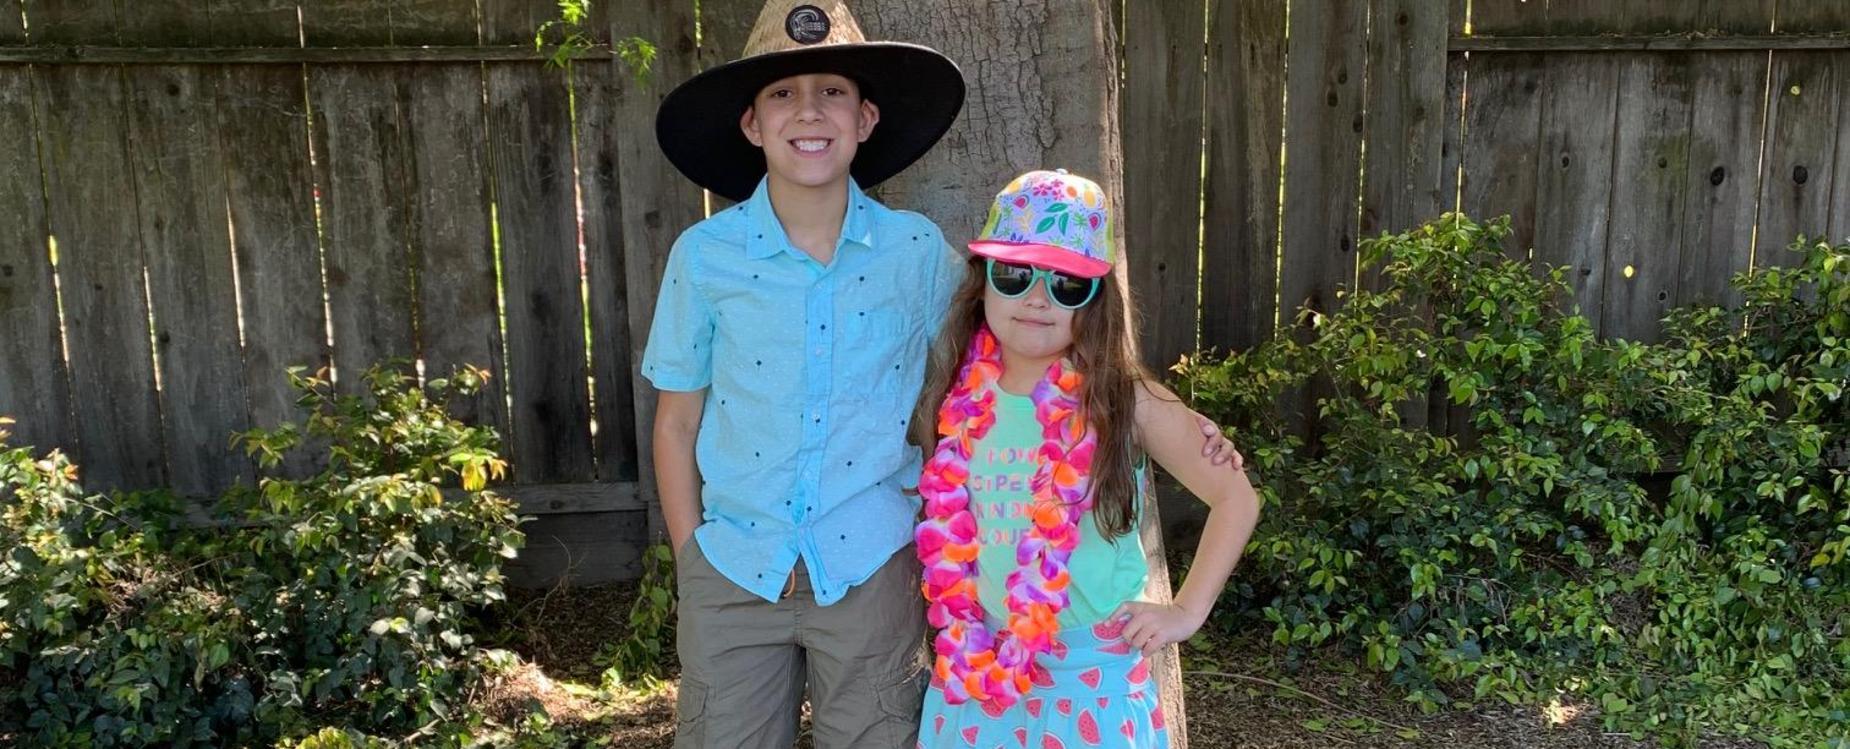 Tourist Day dress up day